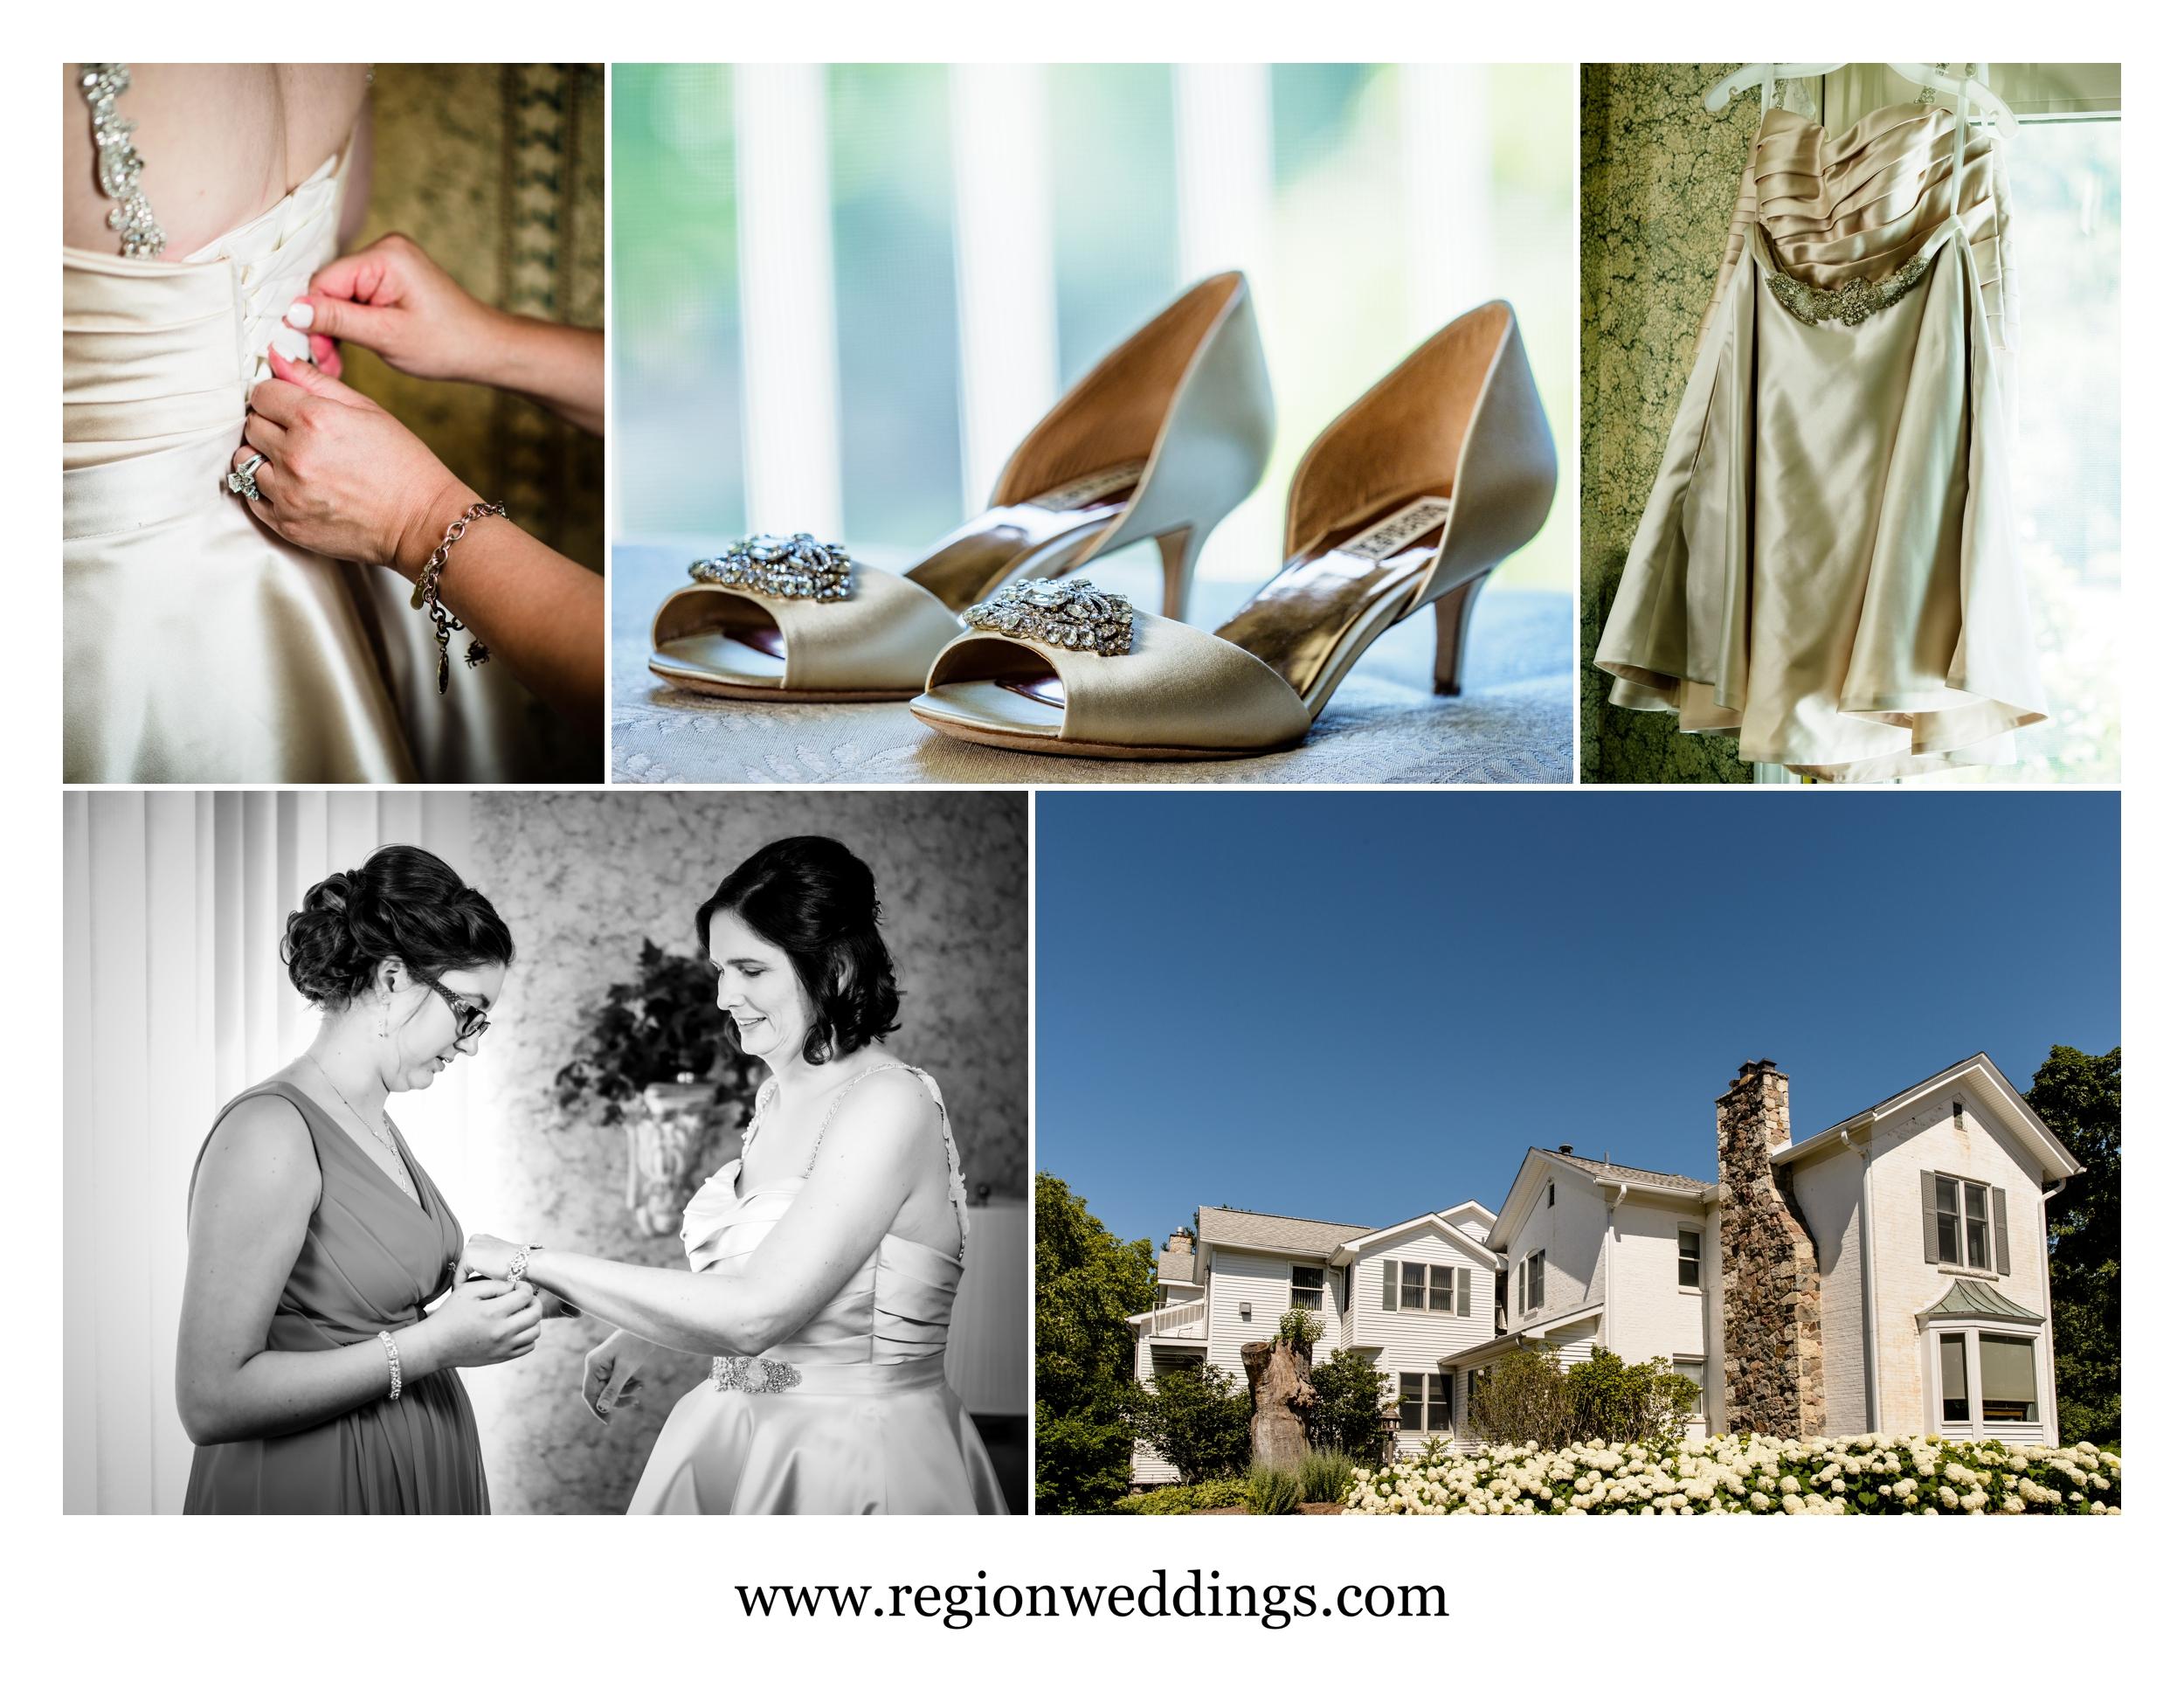 Bridal prep at The Inn At Aberdeen in Valparaiso, Indiana.